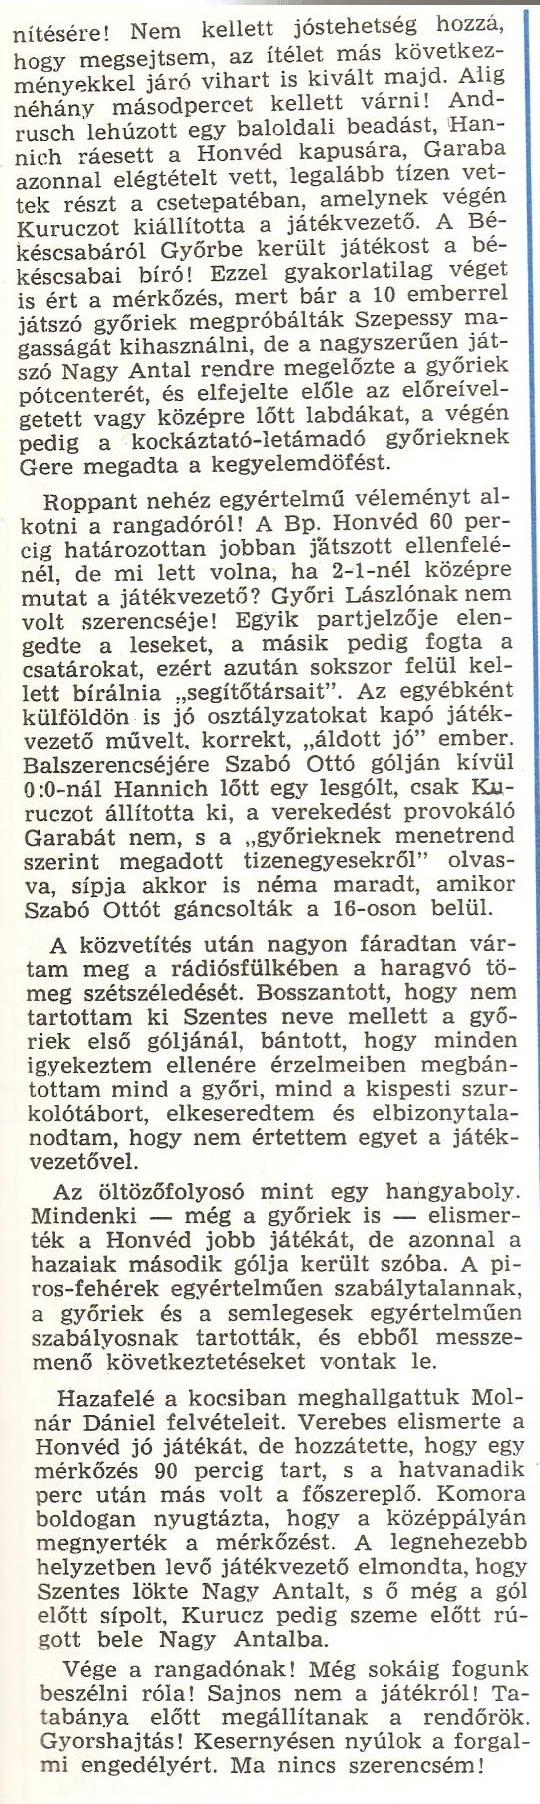 Idokapszula_nb1_1983-84_19_fordulo_Raba_Honved4.jpg